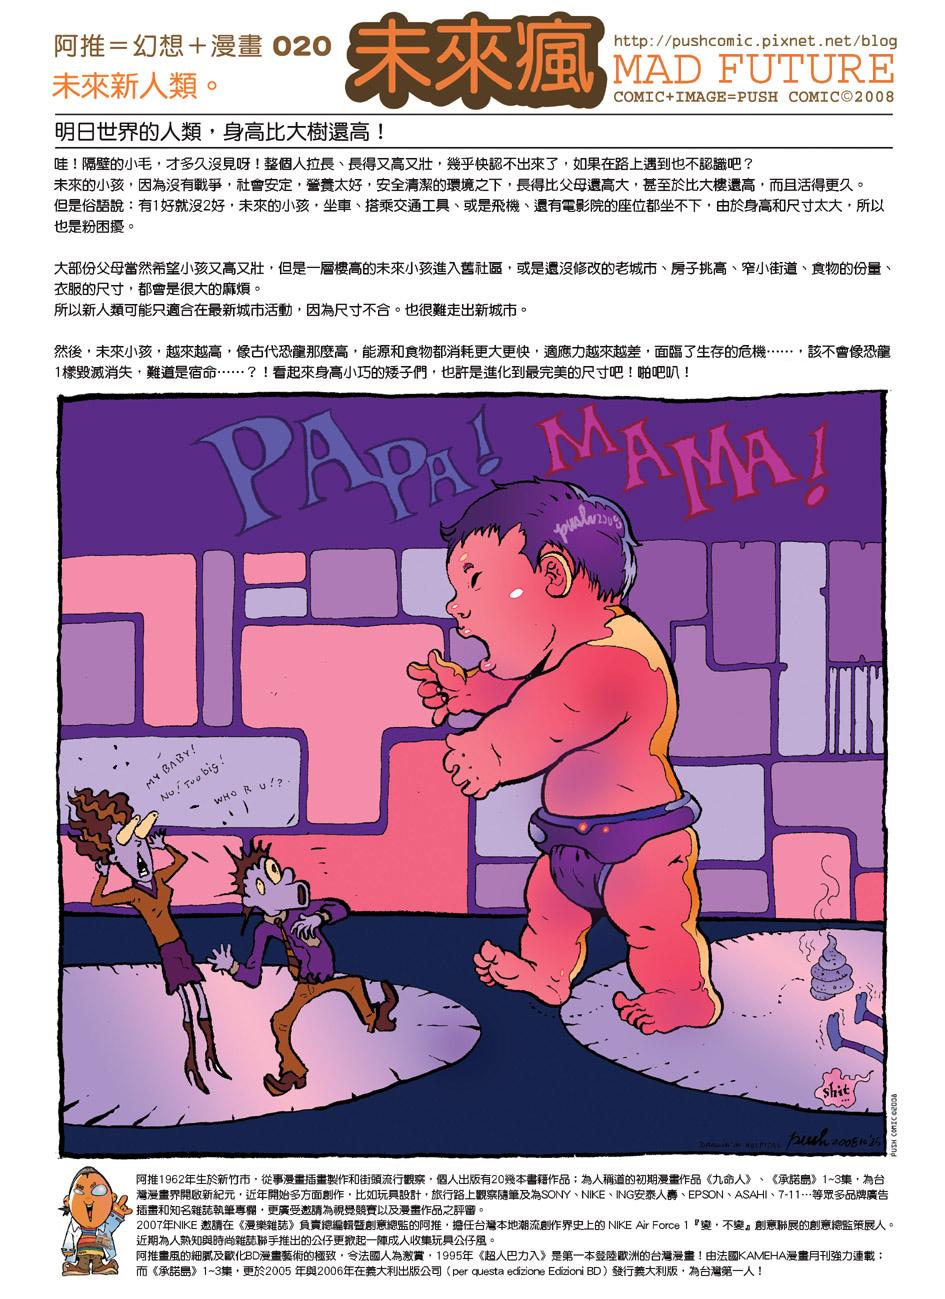 Ming-020-MF-byPUSH-S.jpg